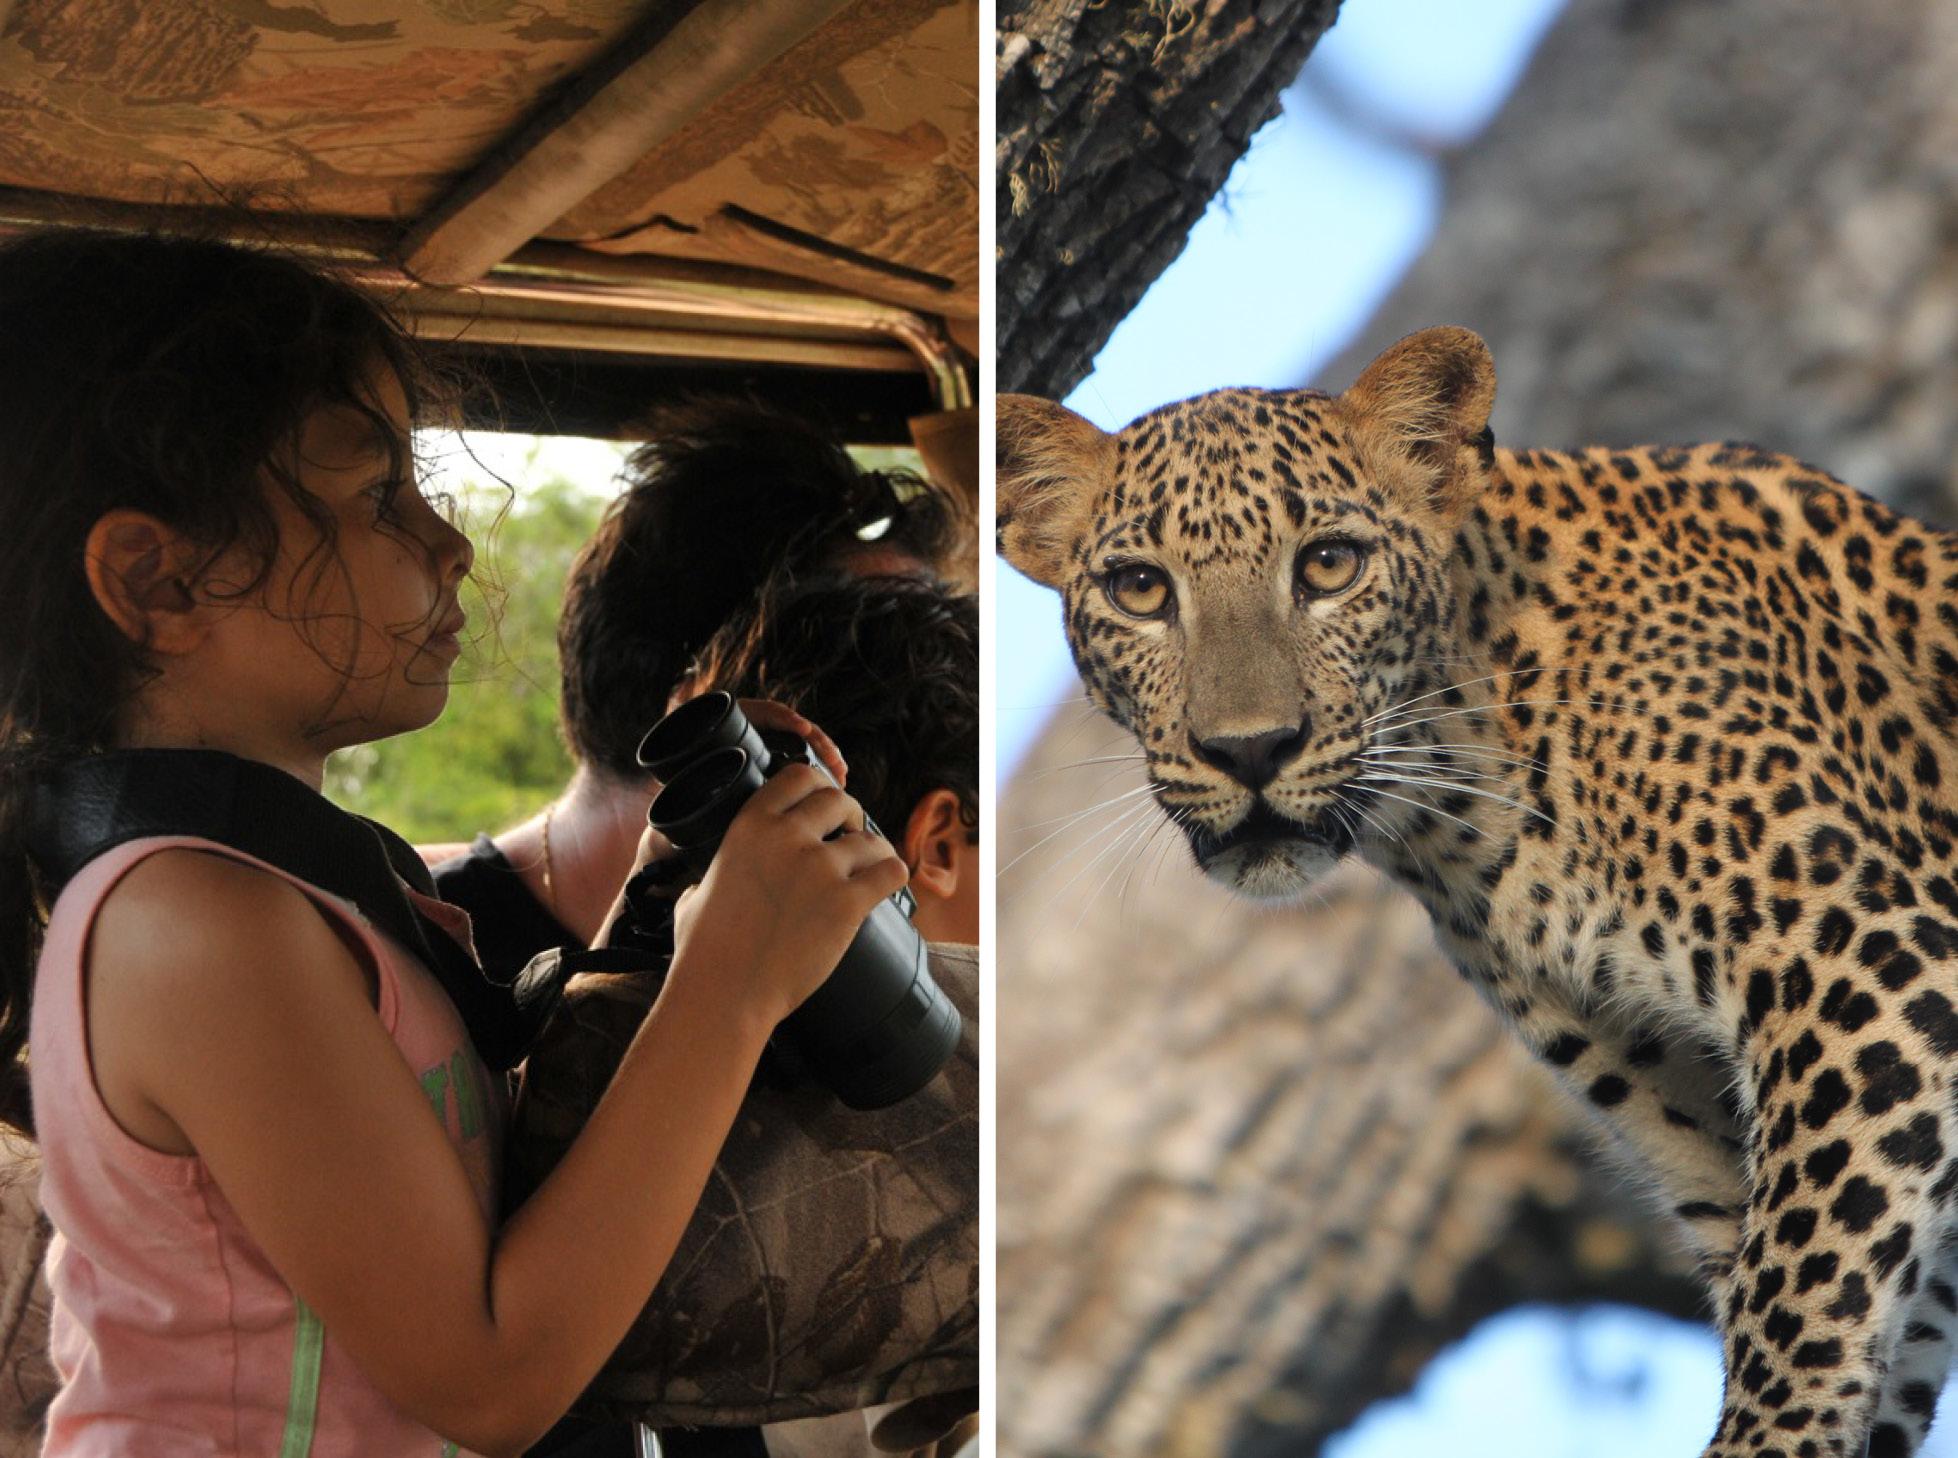 noel-rodrigo-leopard-safari-yala-national-park-sri-lanka-leopard